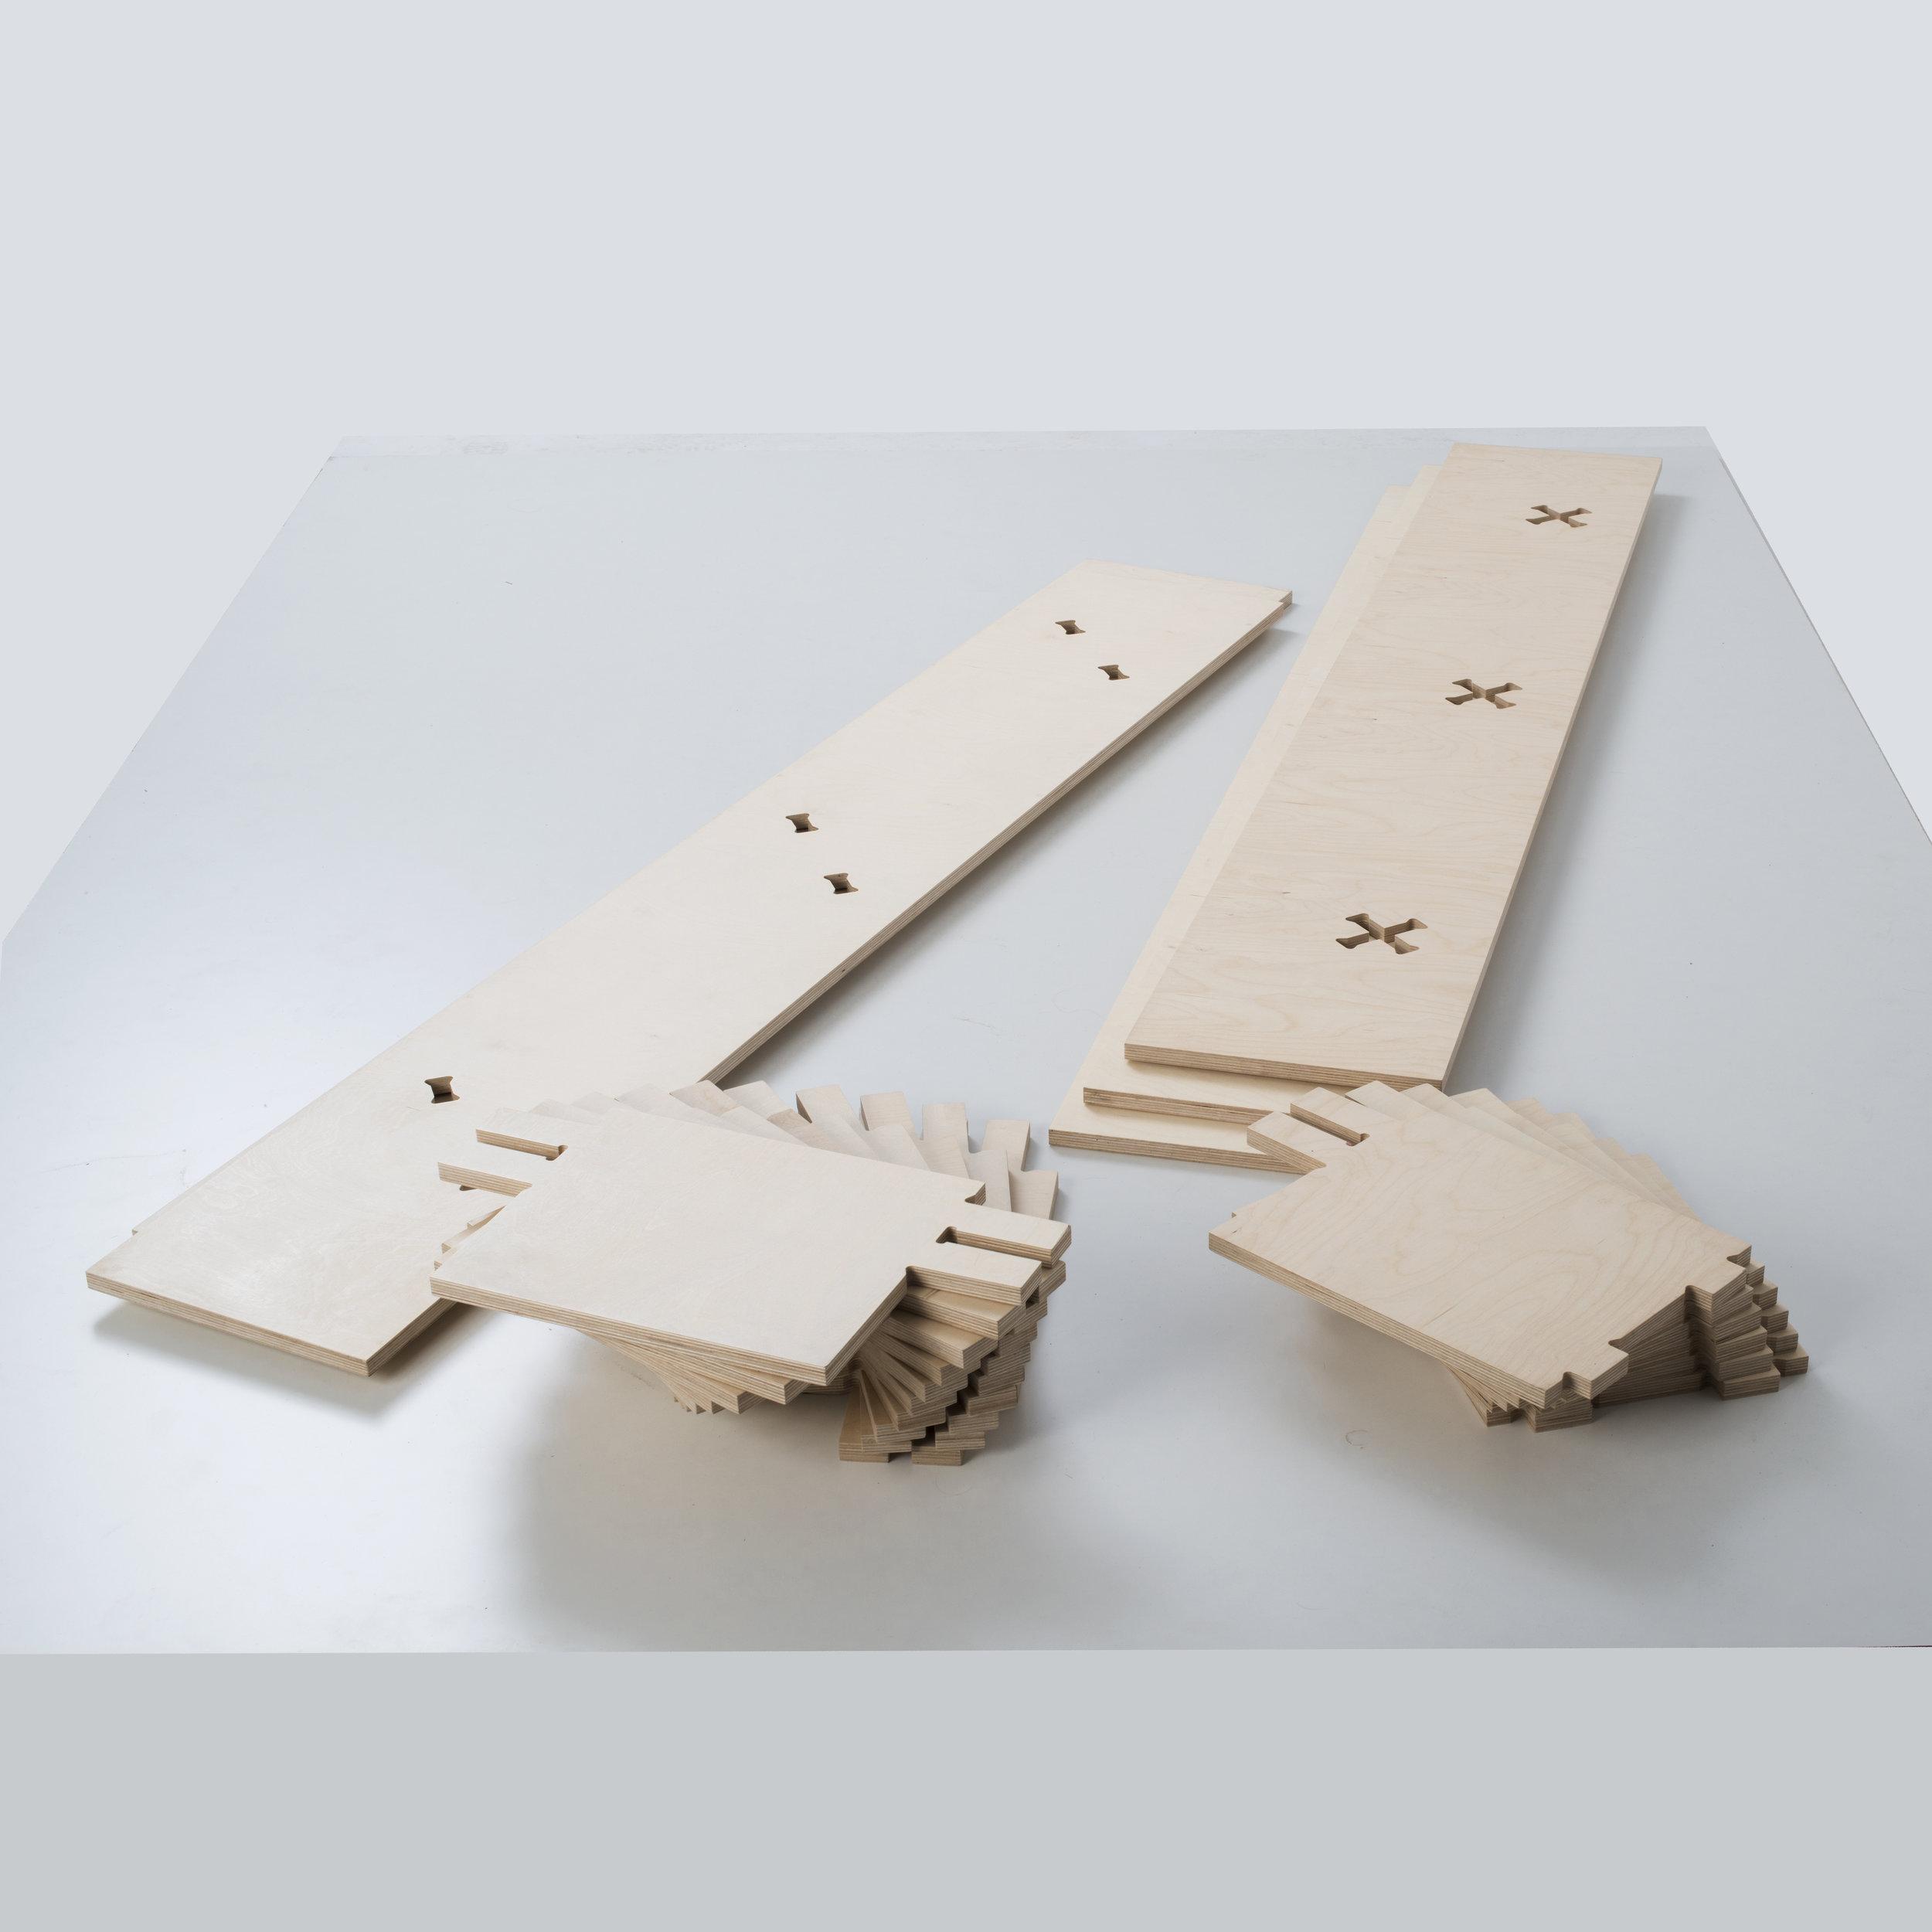 FIT_Furniture-Neubau_shelf_Parts-Ronen_Kadushin